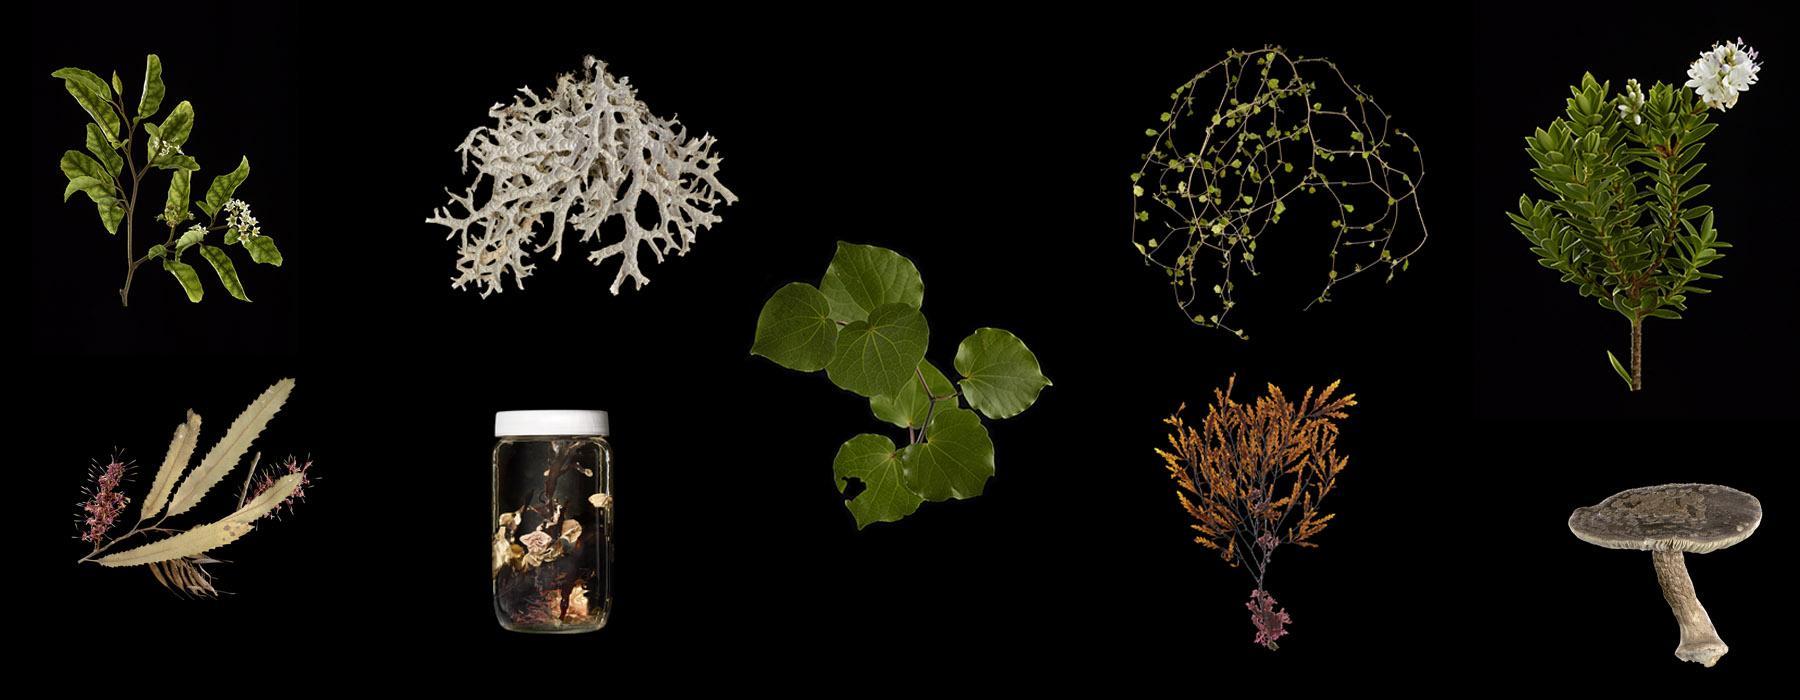 Nine plant specimens on a black background